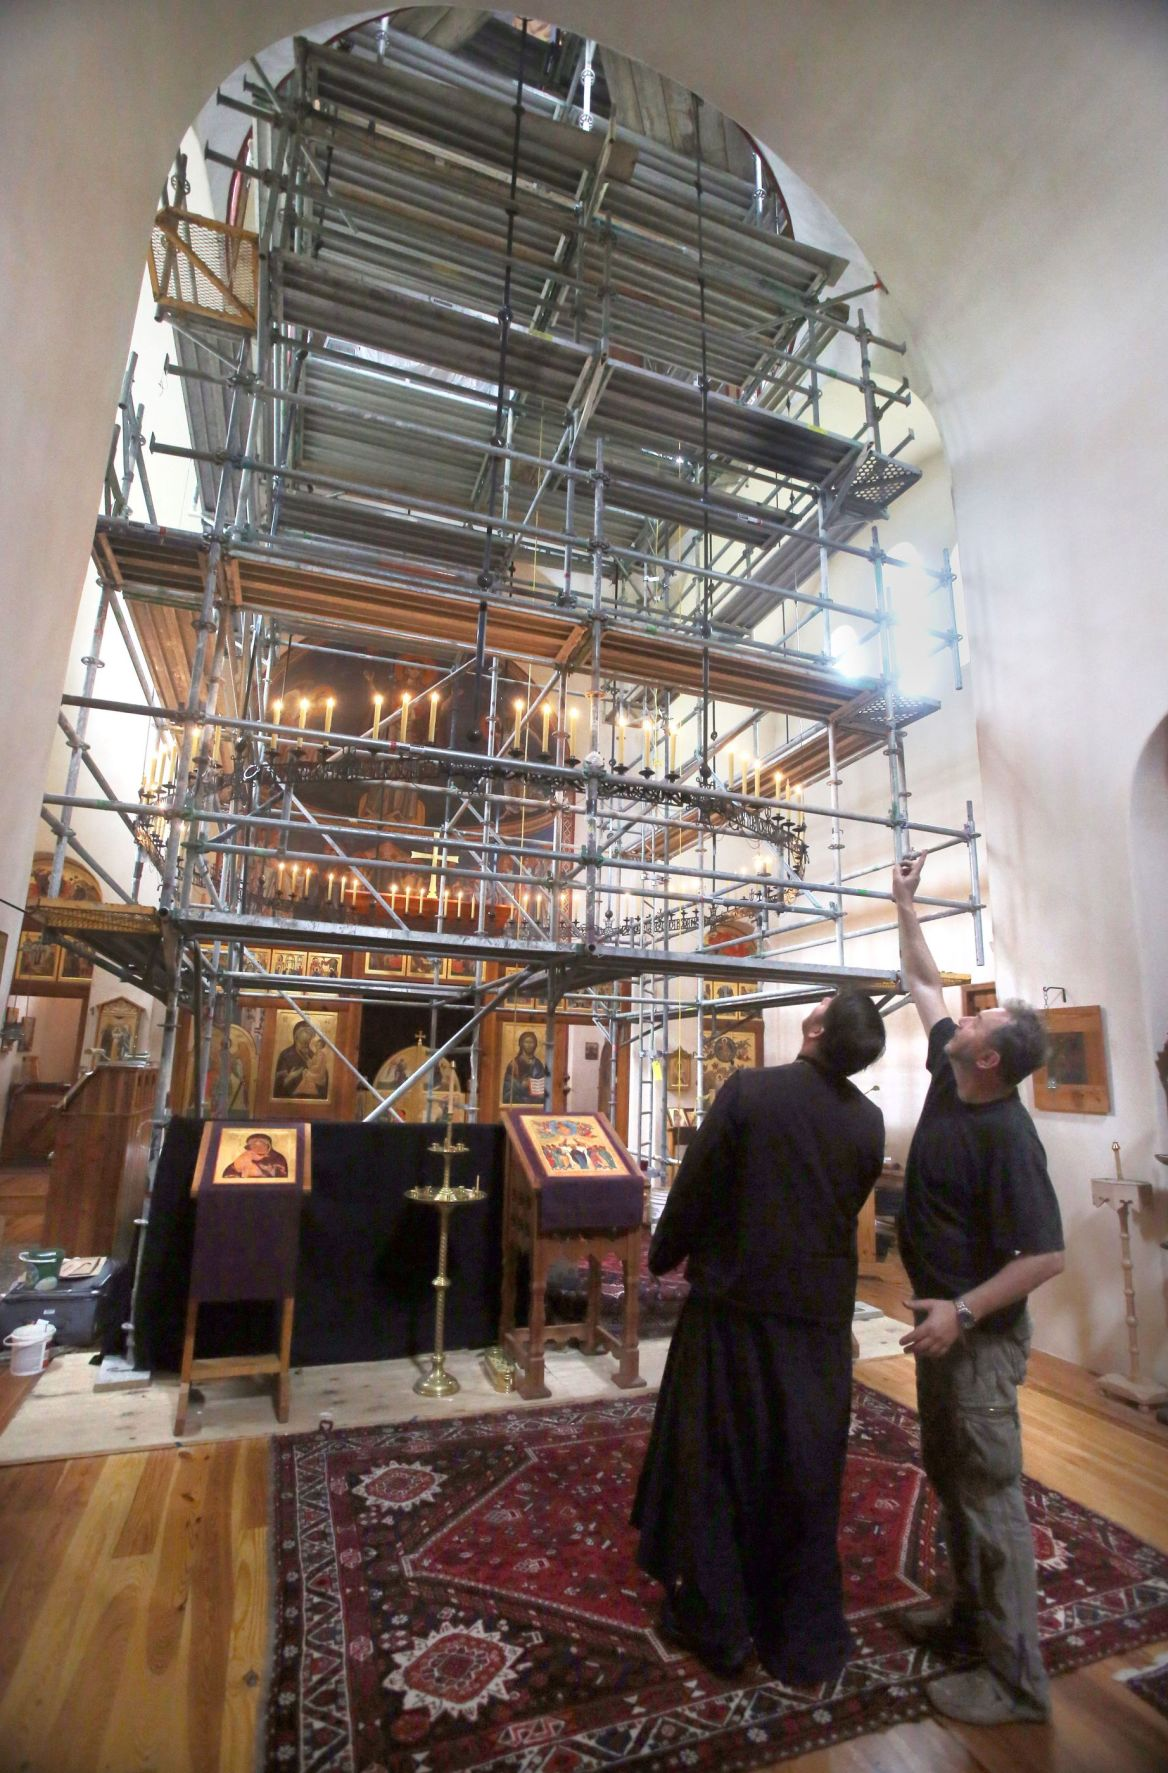 Story of faith New icons transform Mount Pleasant church